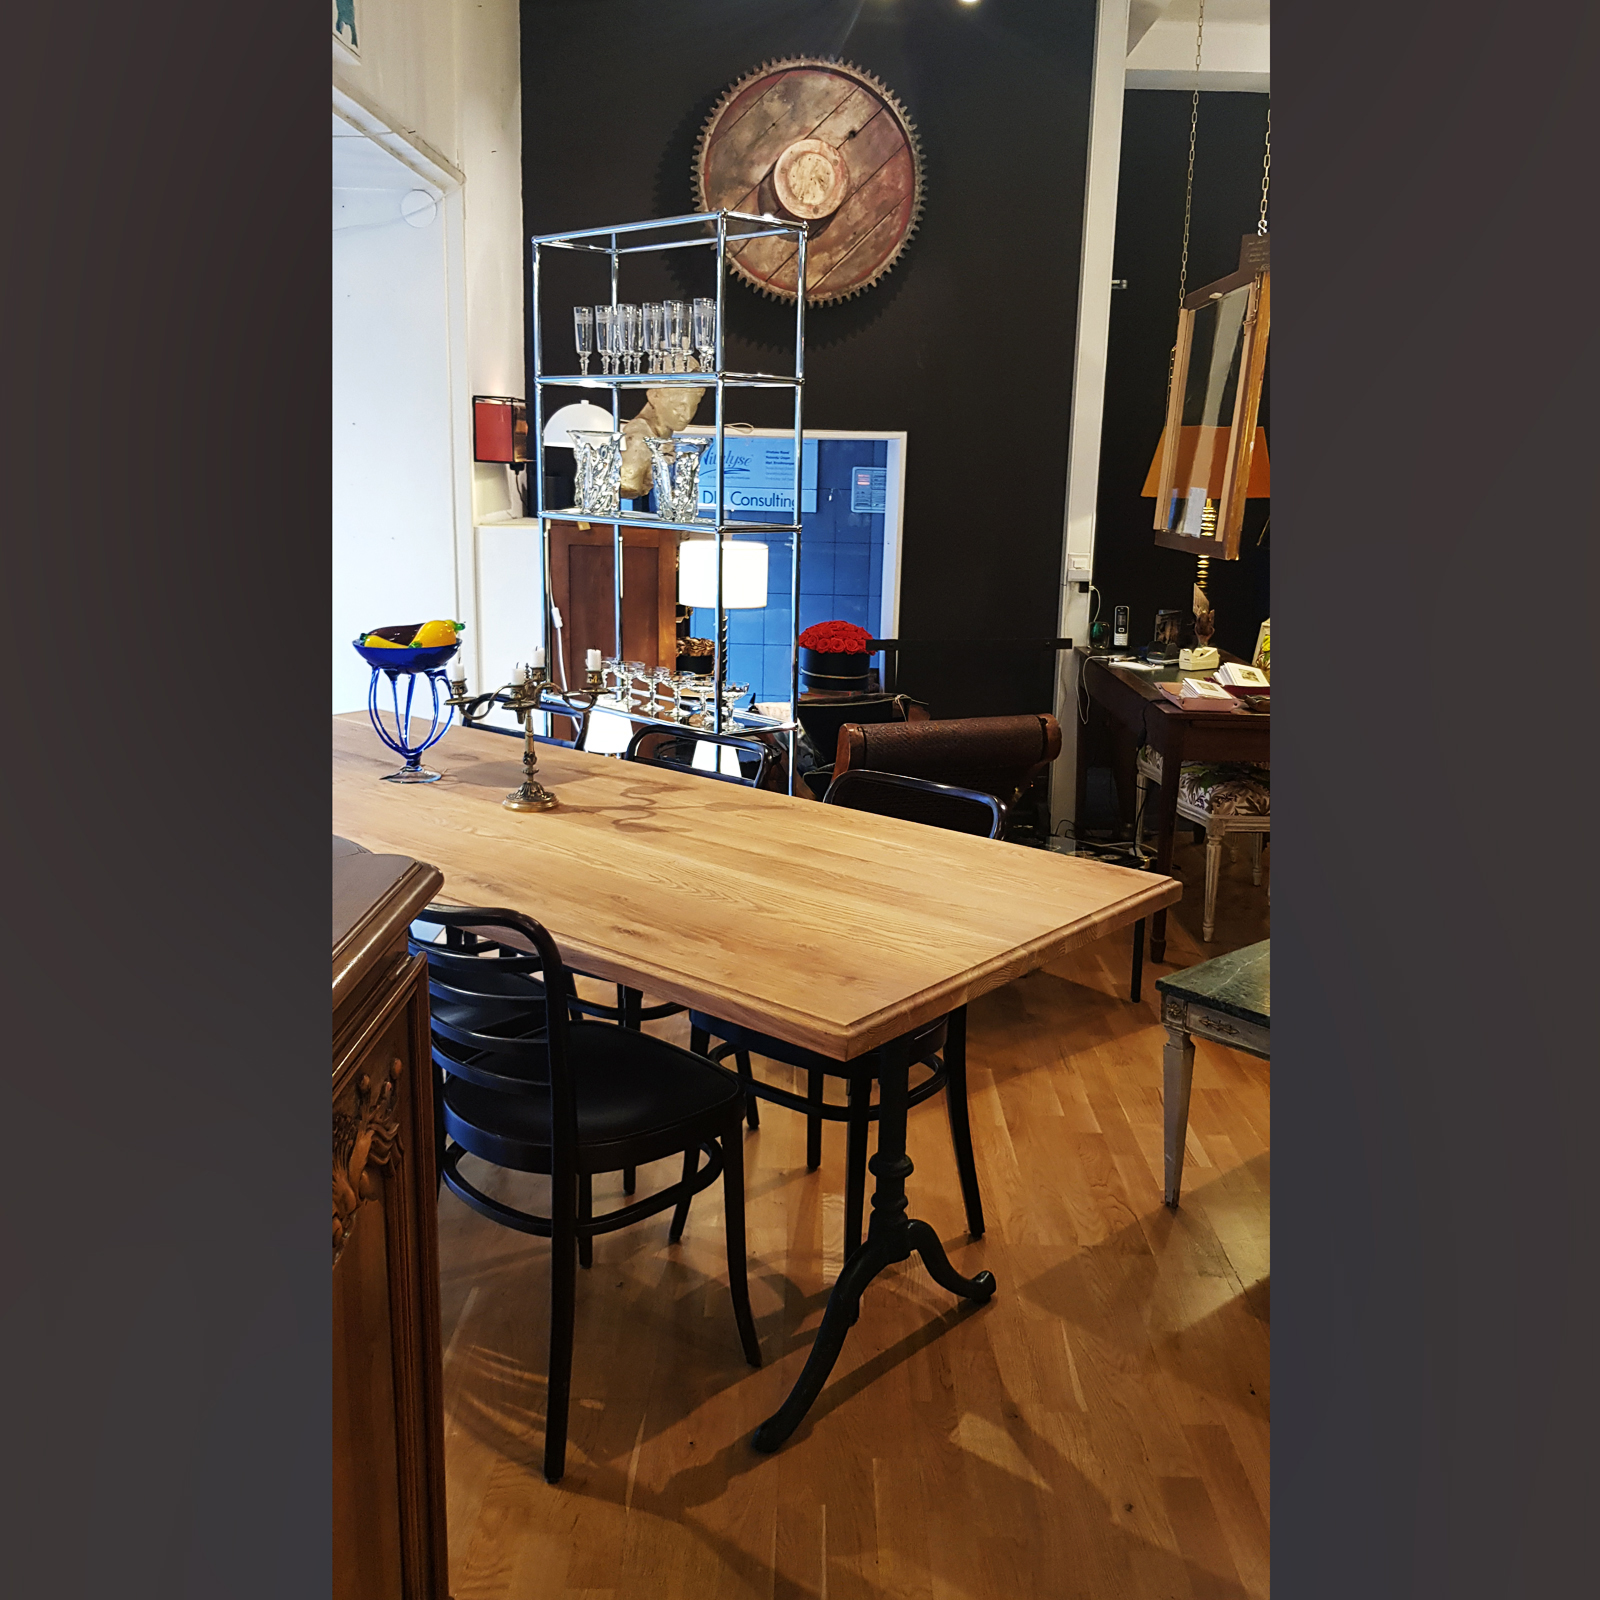 Art & Vivre - Interieur und Kunstobjekte, 4051 Basel